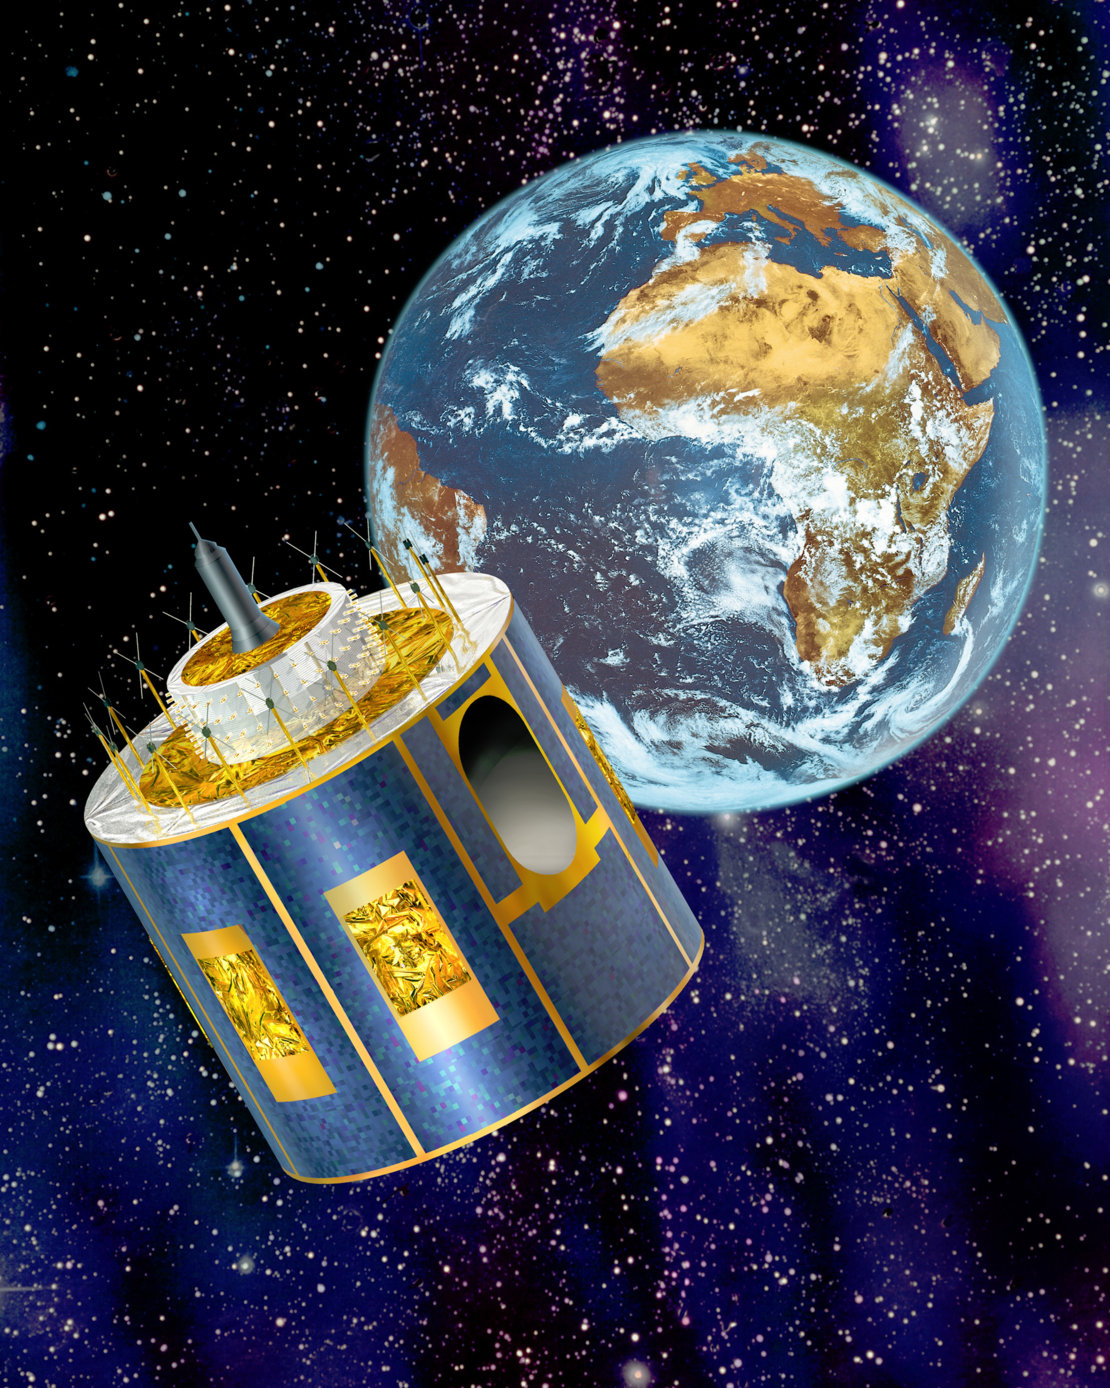 Meteosat Second Generation (MSG) / 10 / 2009 / Images / ESA